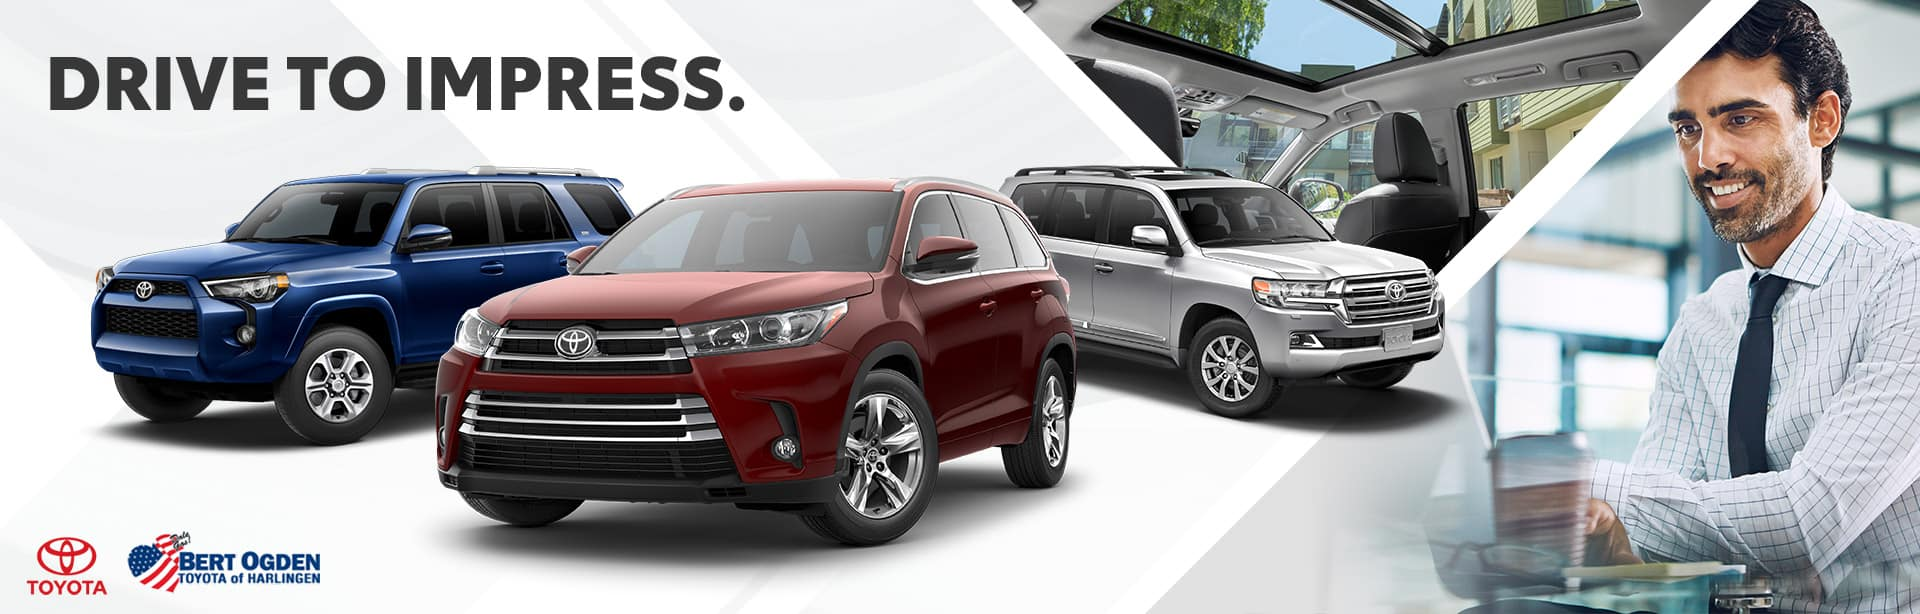 Toyota Models to Impress | Bert Ogden Toyota | Harlingen, TX